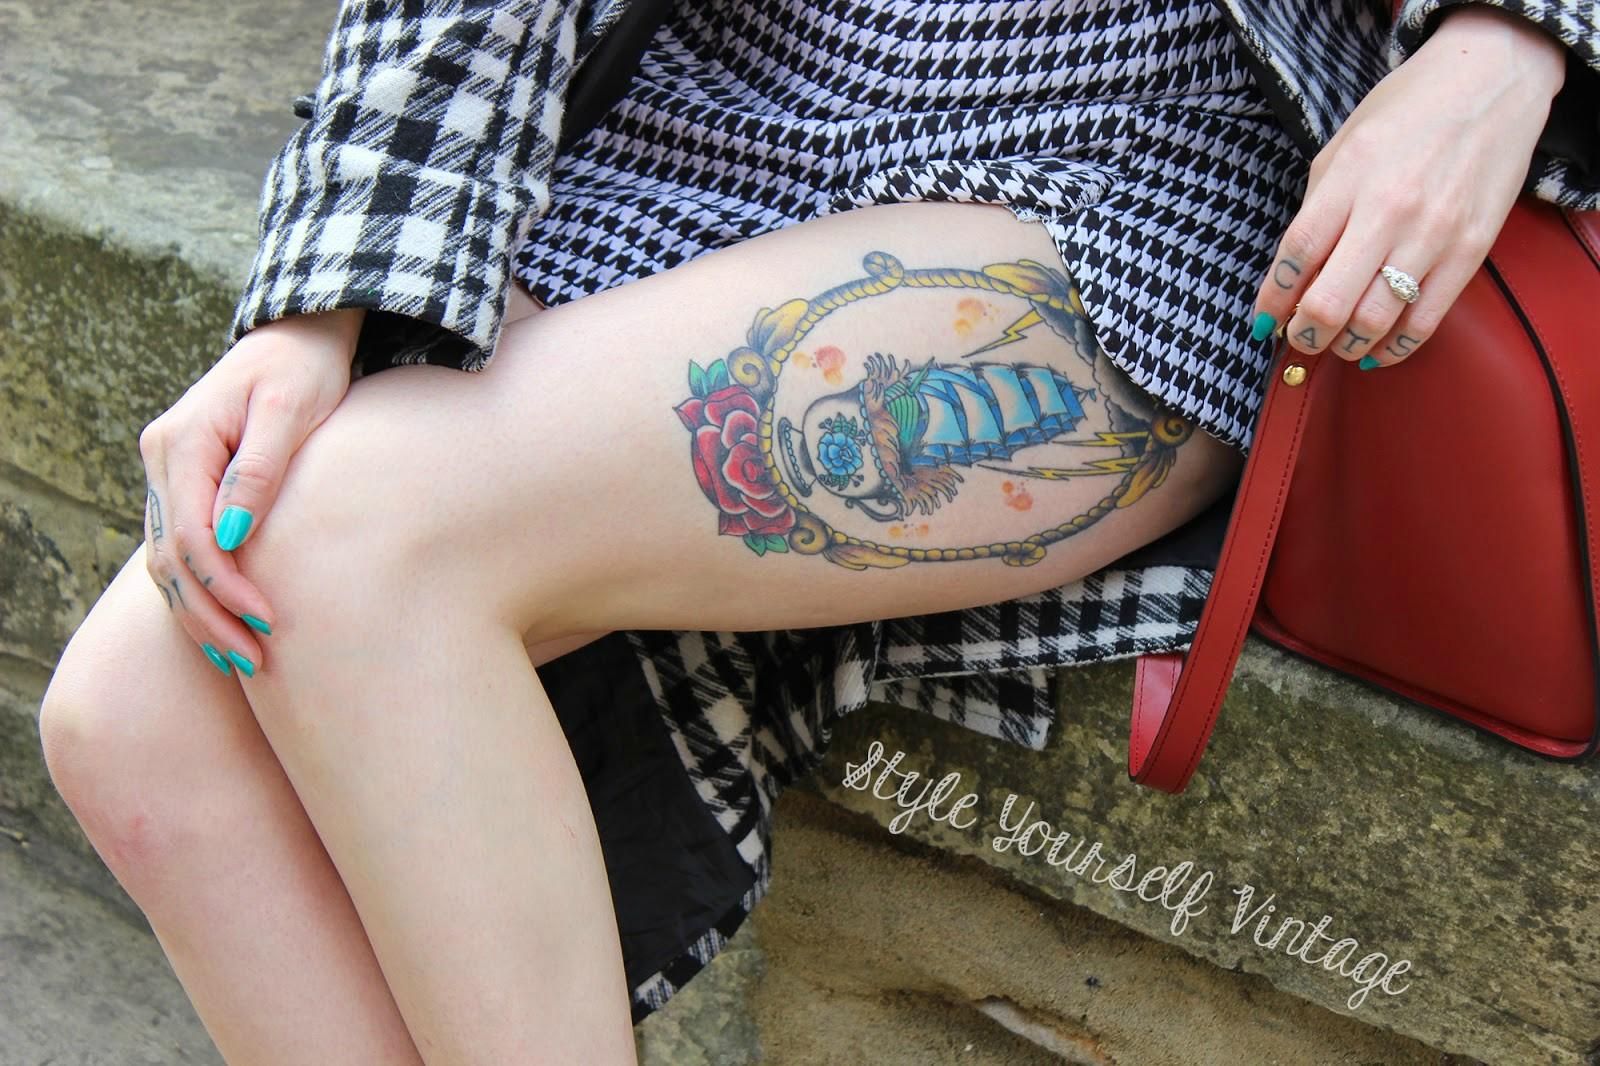 Appealing Tattoos for Women 103